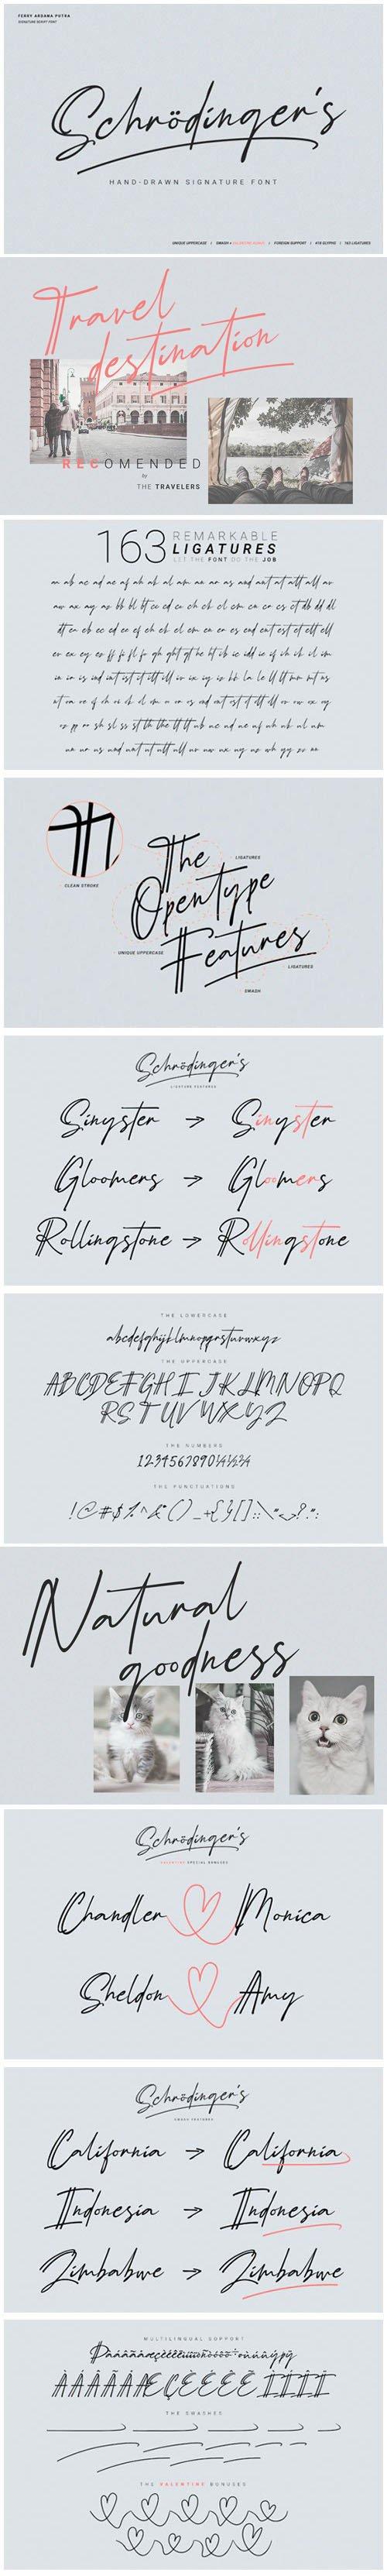 Schrodinger's Signature - Hand-Drawn Remarkable Font